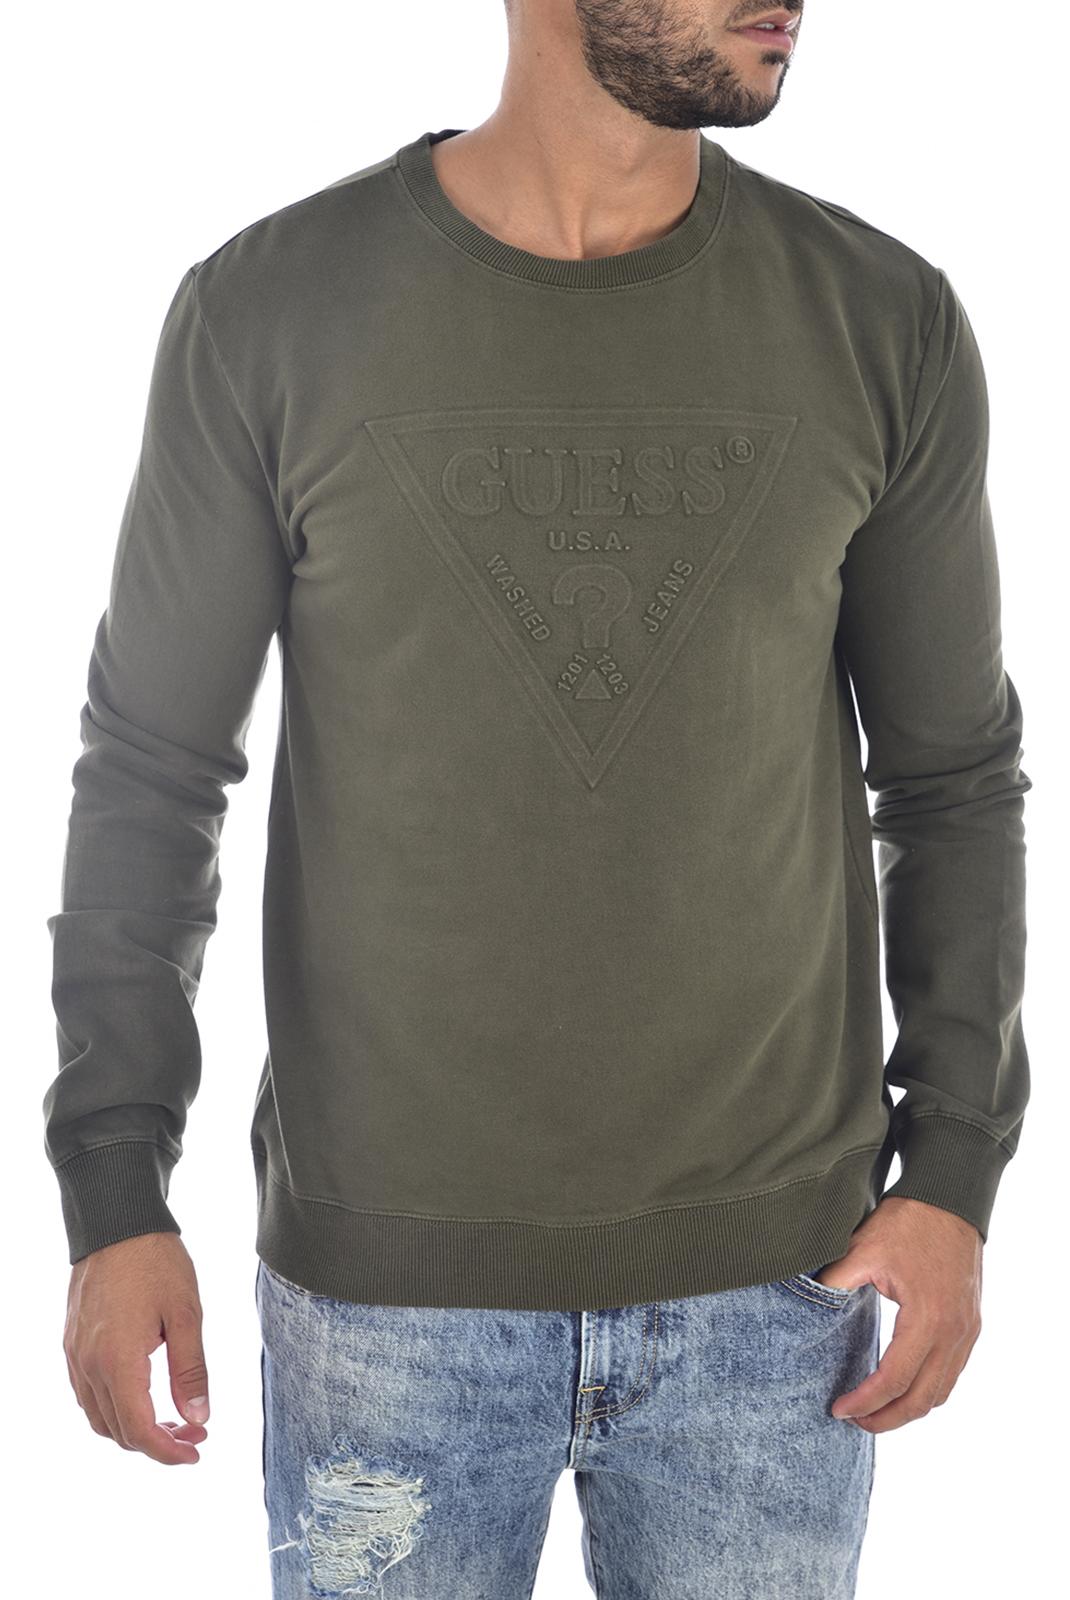 Pulls & Gilets  Guess jeans M94Q35 K92C0 G8G9 HUNTER GREEN